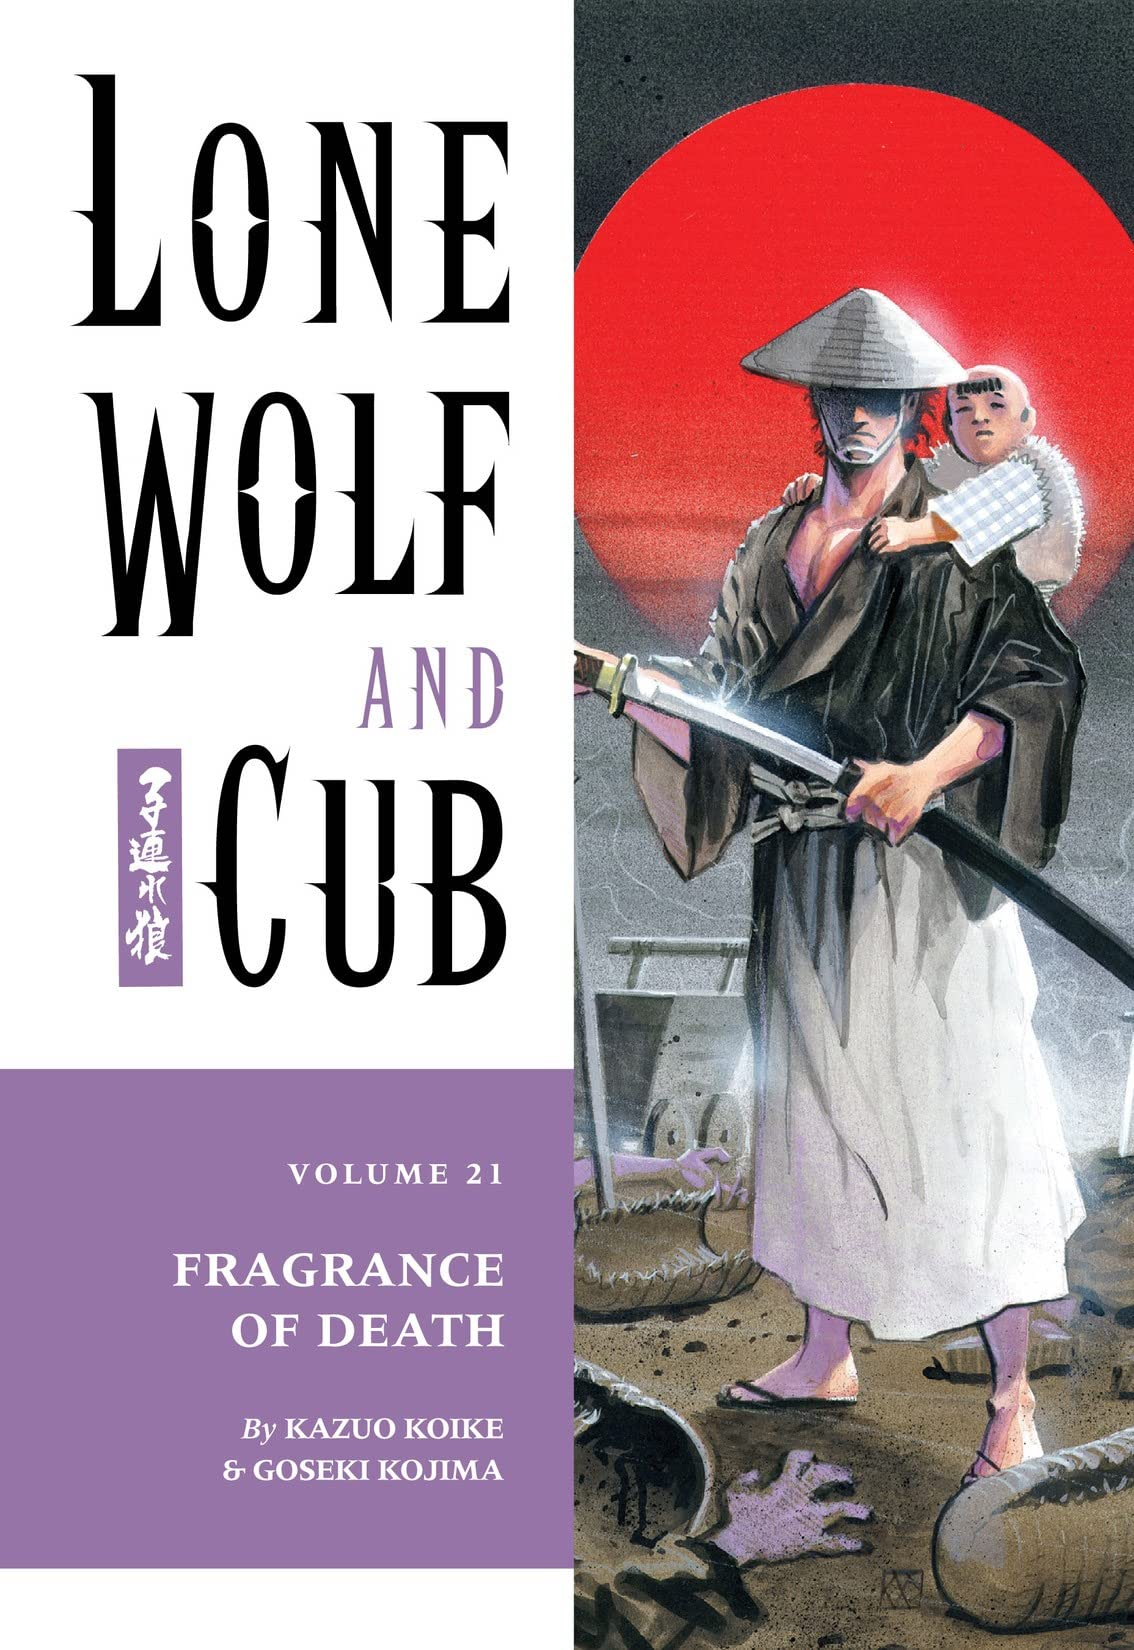 Lone Wolf and Cub Vol. 21: Fragrance of Death